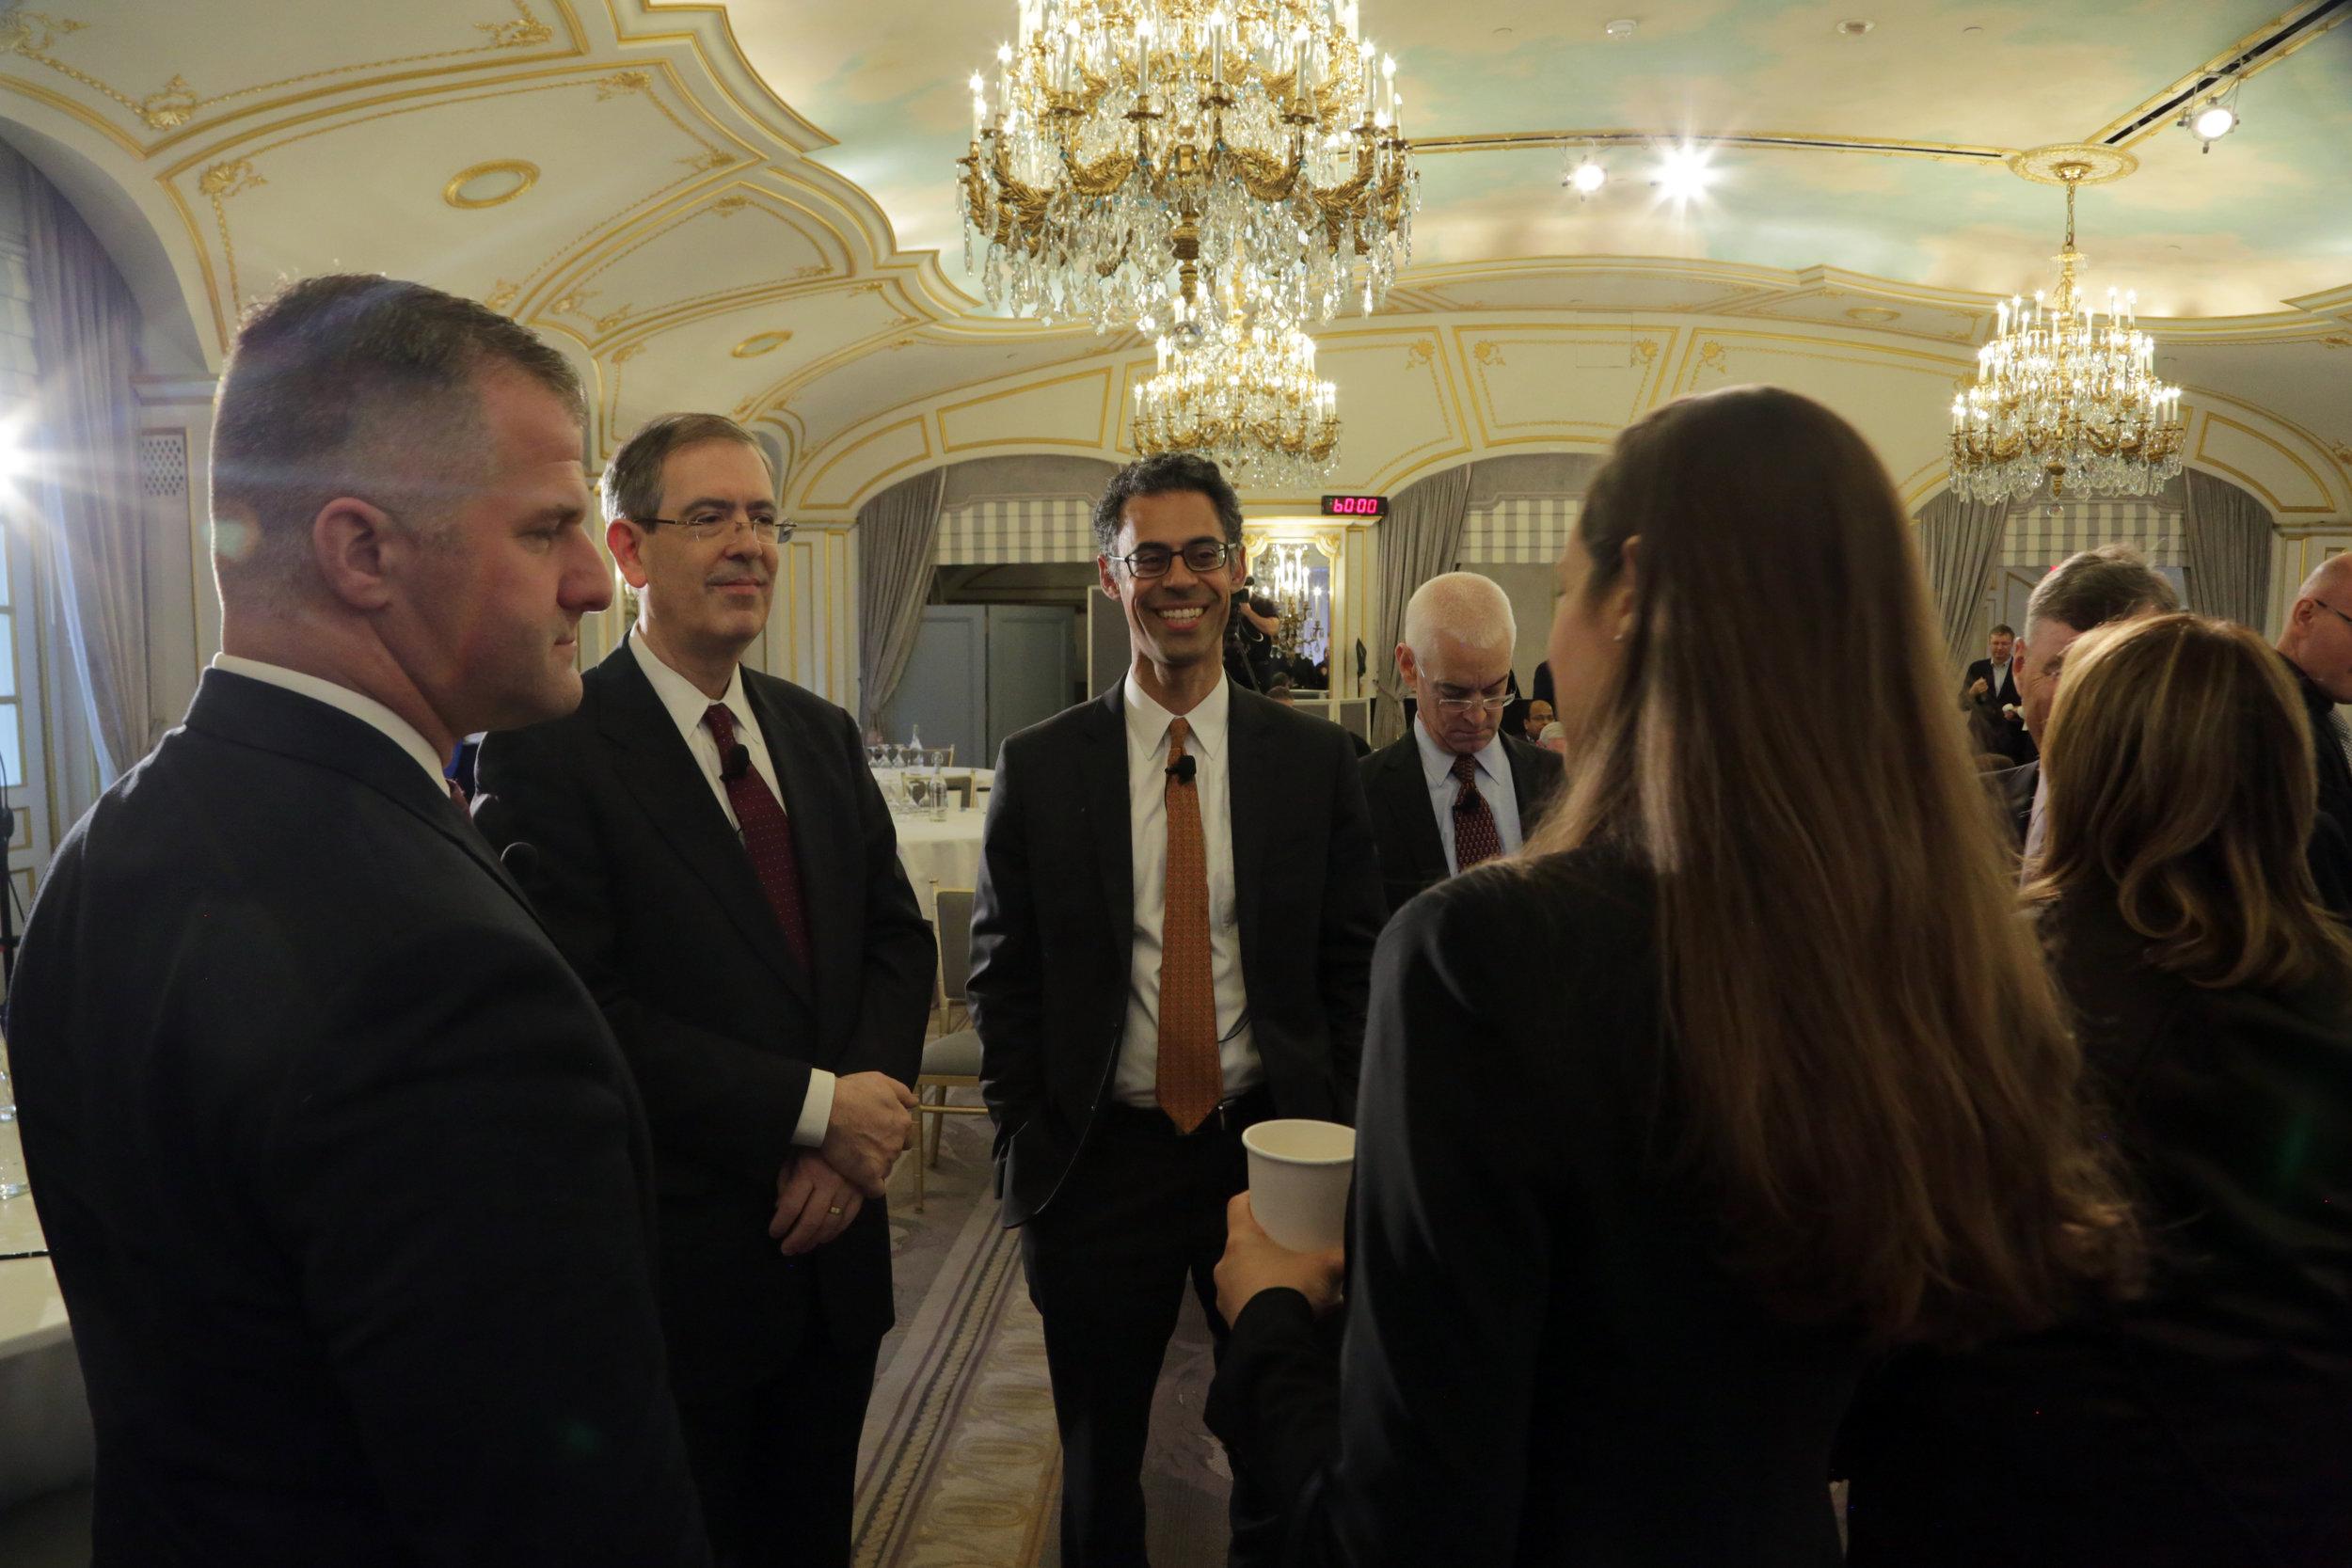 McKinsey event at the St. Regis Hotel, Spring 2018.